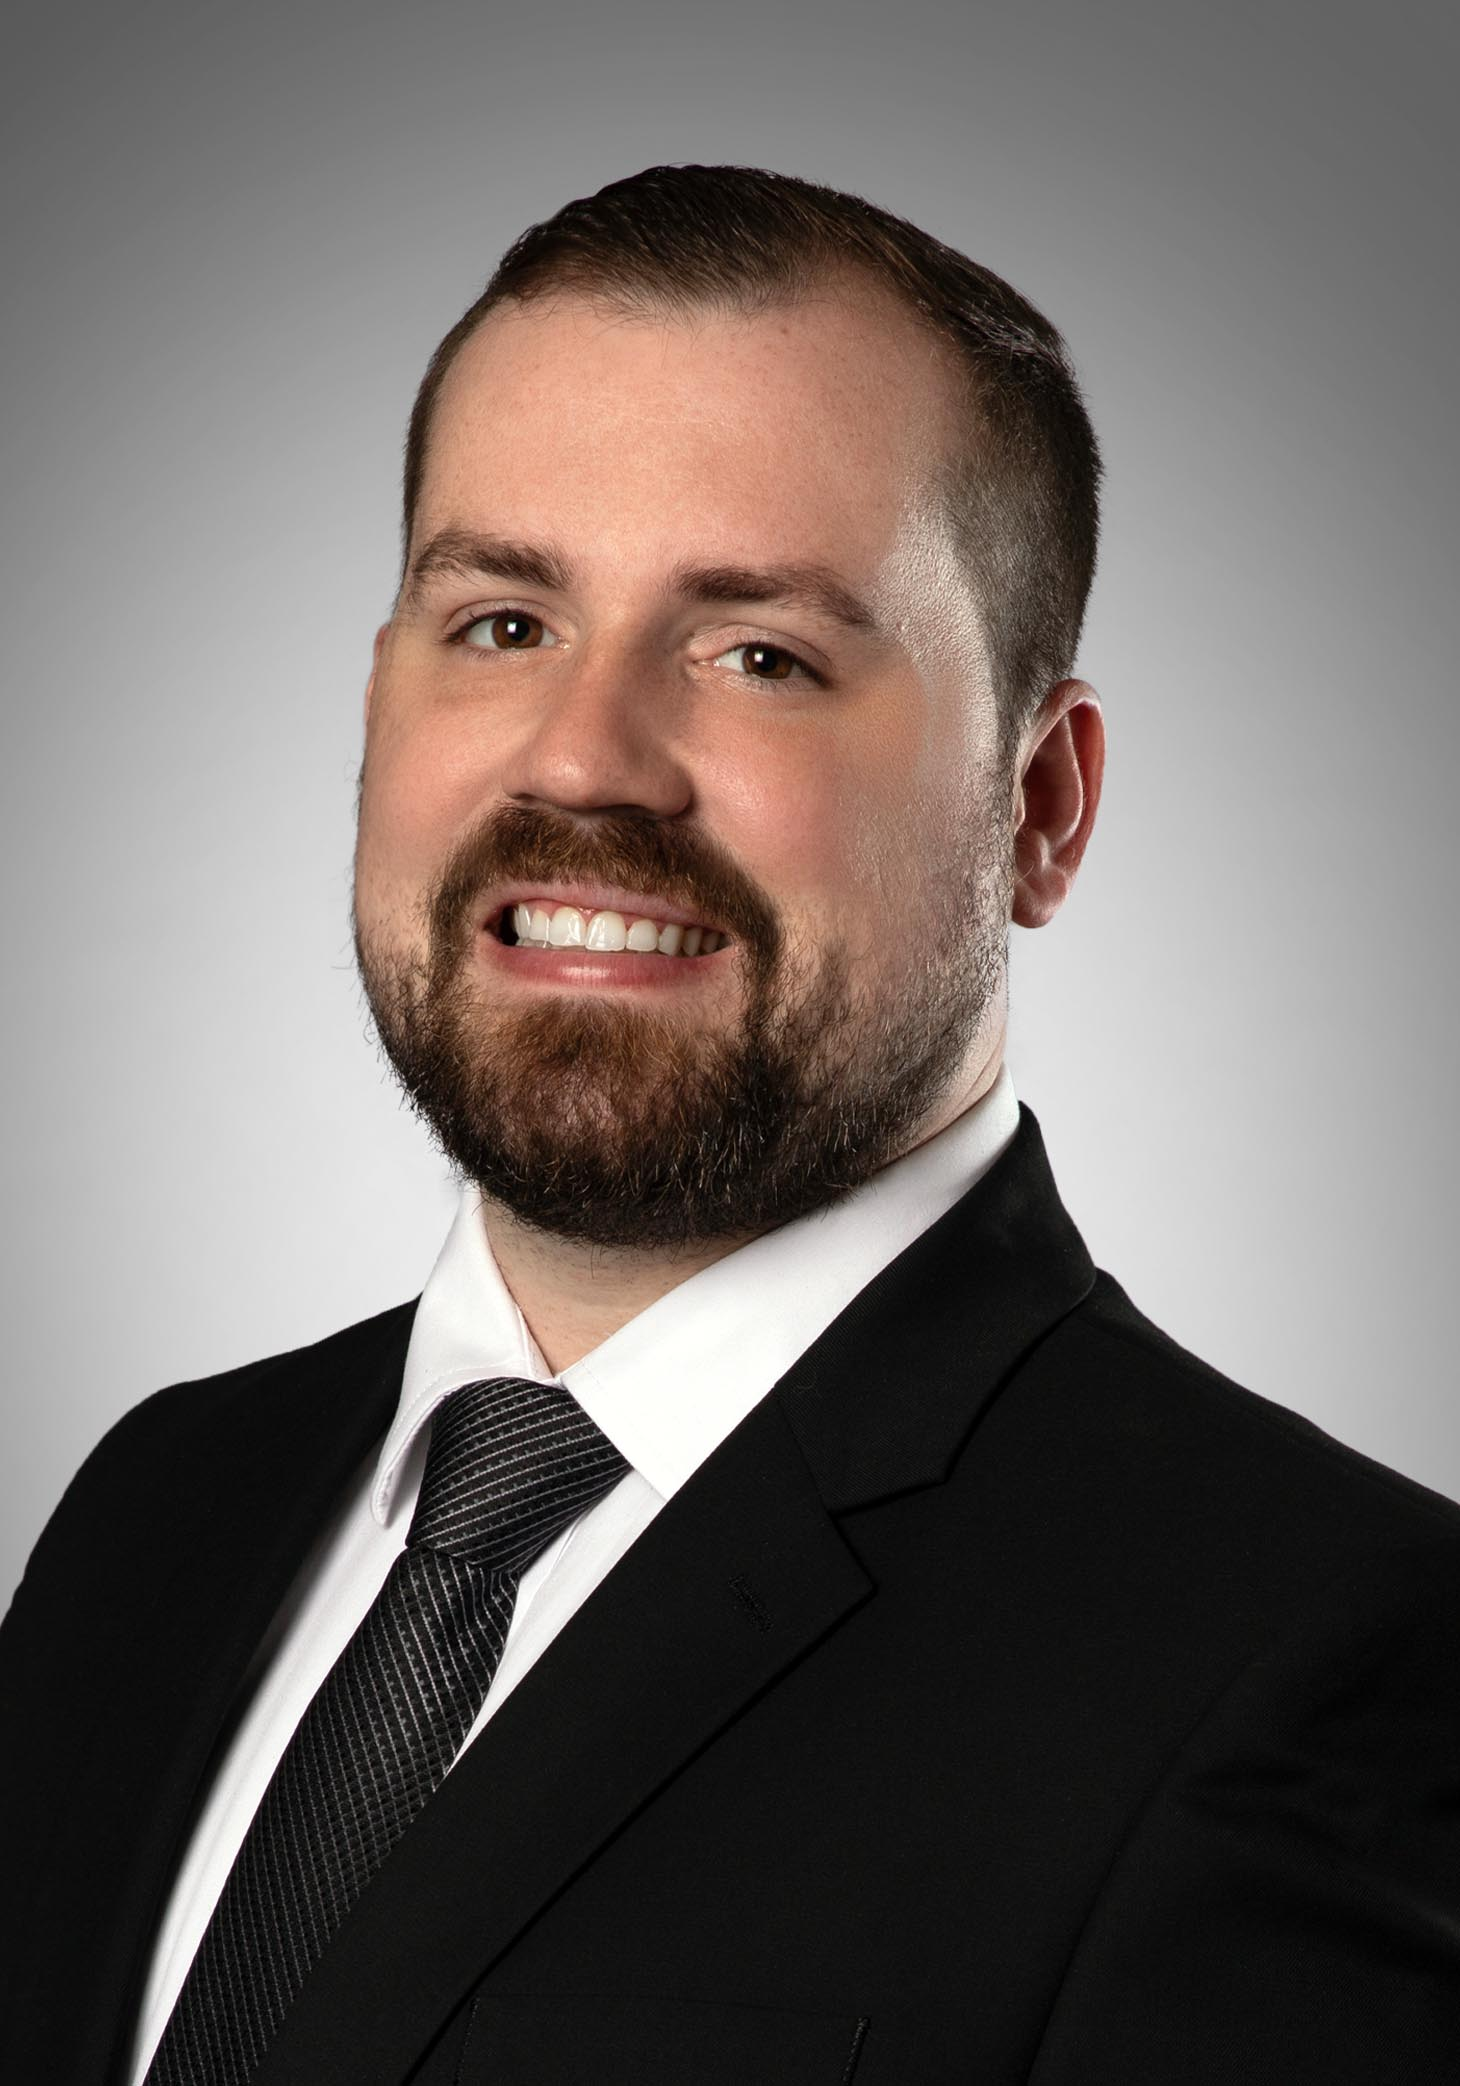 Daniel R. Latowski